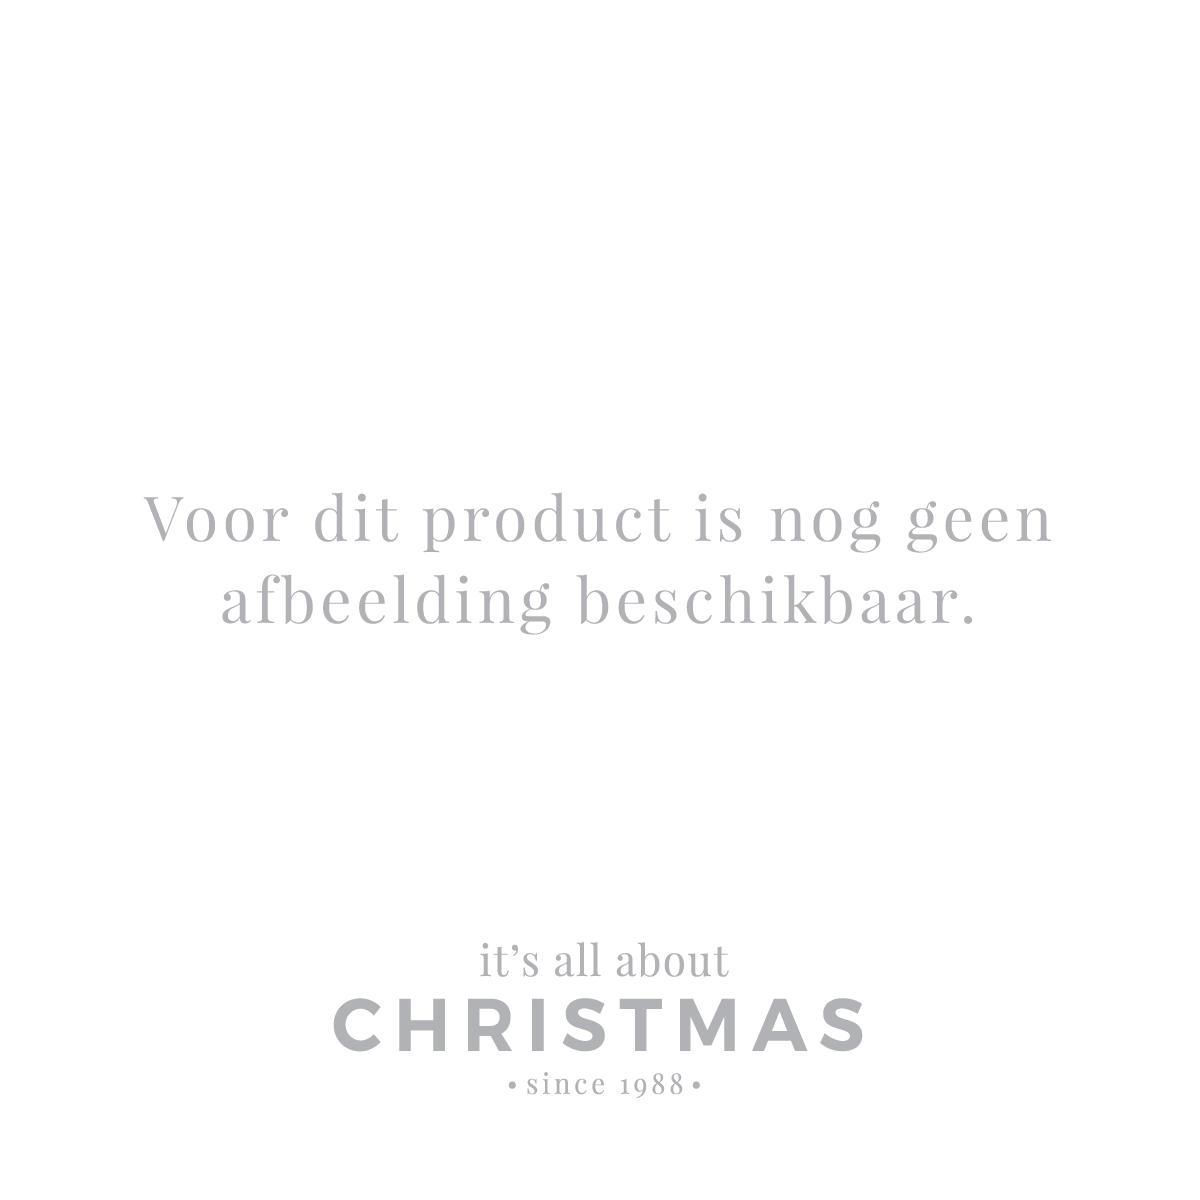 Glass Christmas Bauble Soap Bubble Effect & Iridescent Ribbon 8cm